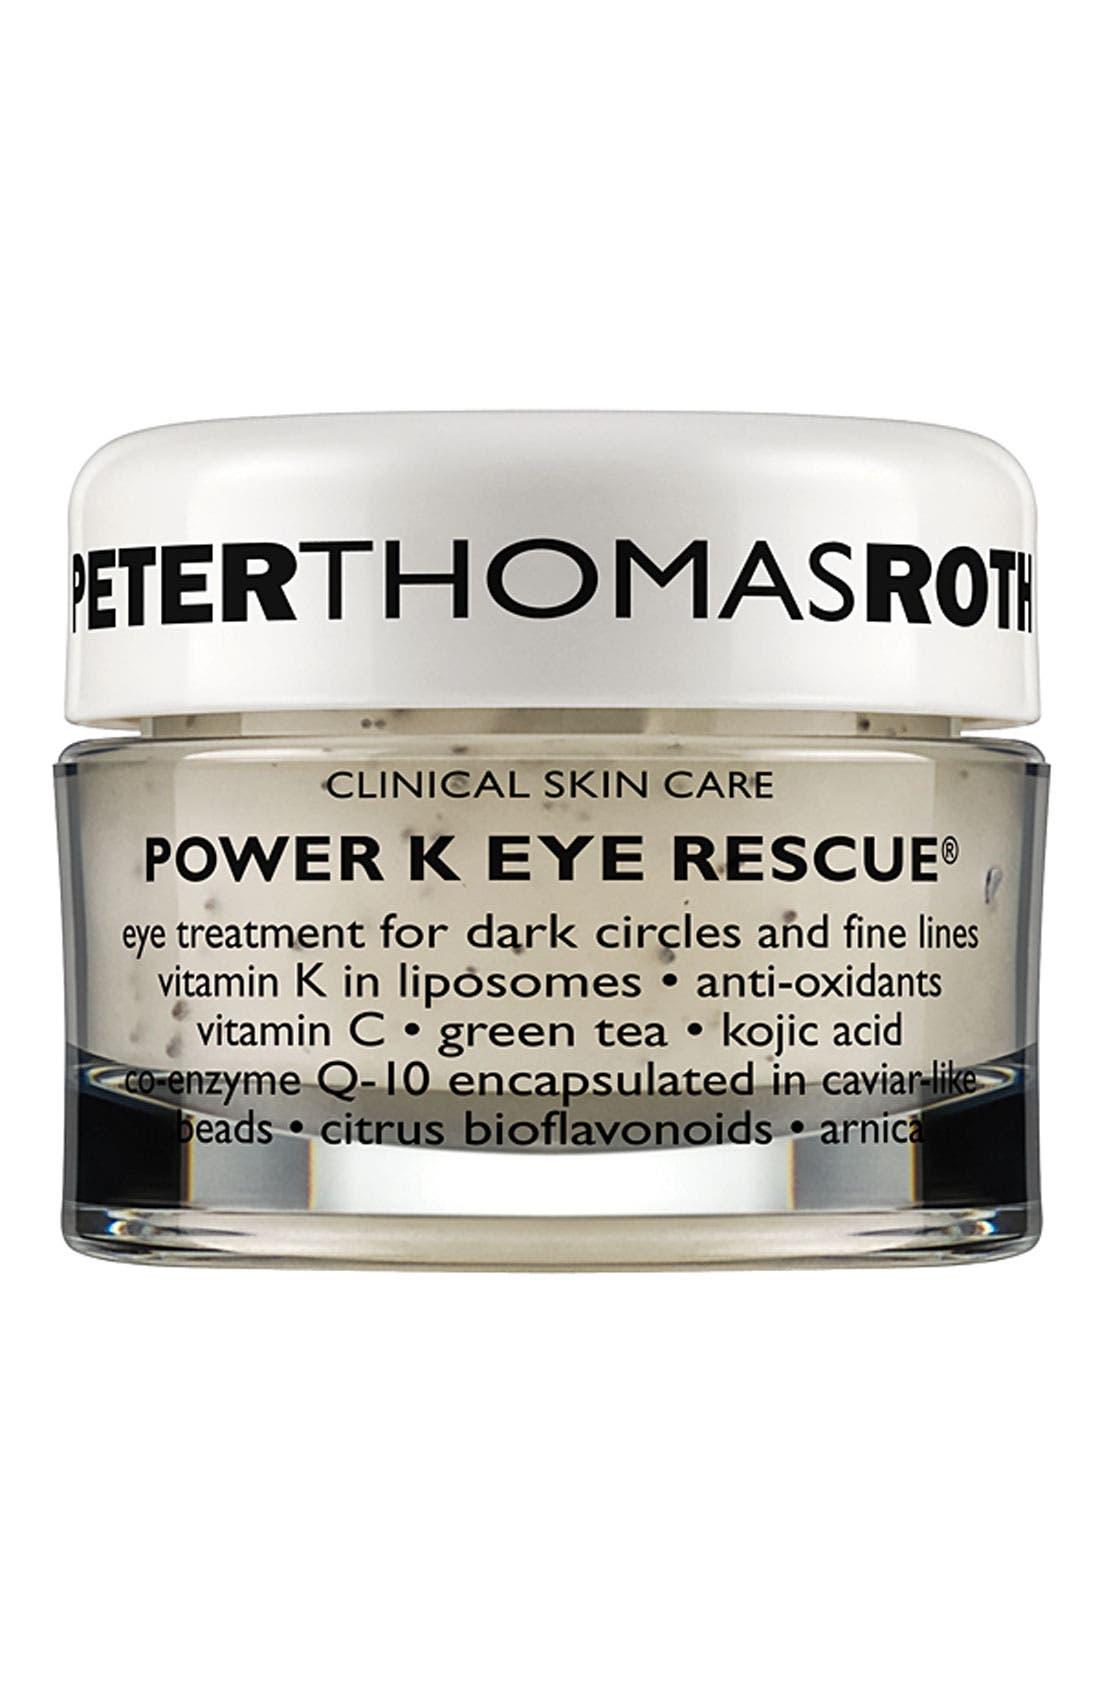 Peter Thomas Roth 'Power K' Eye Rescue®